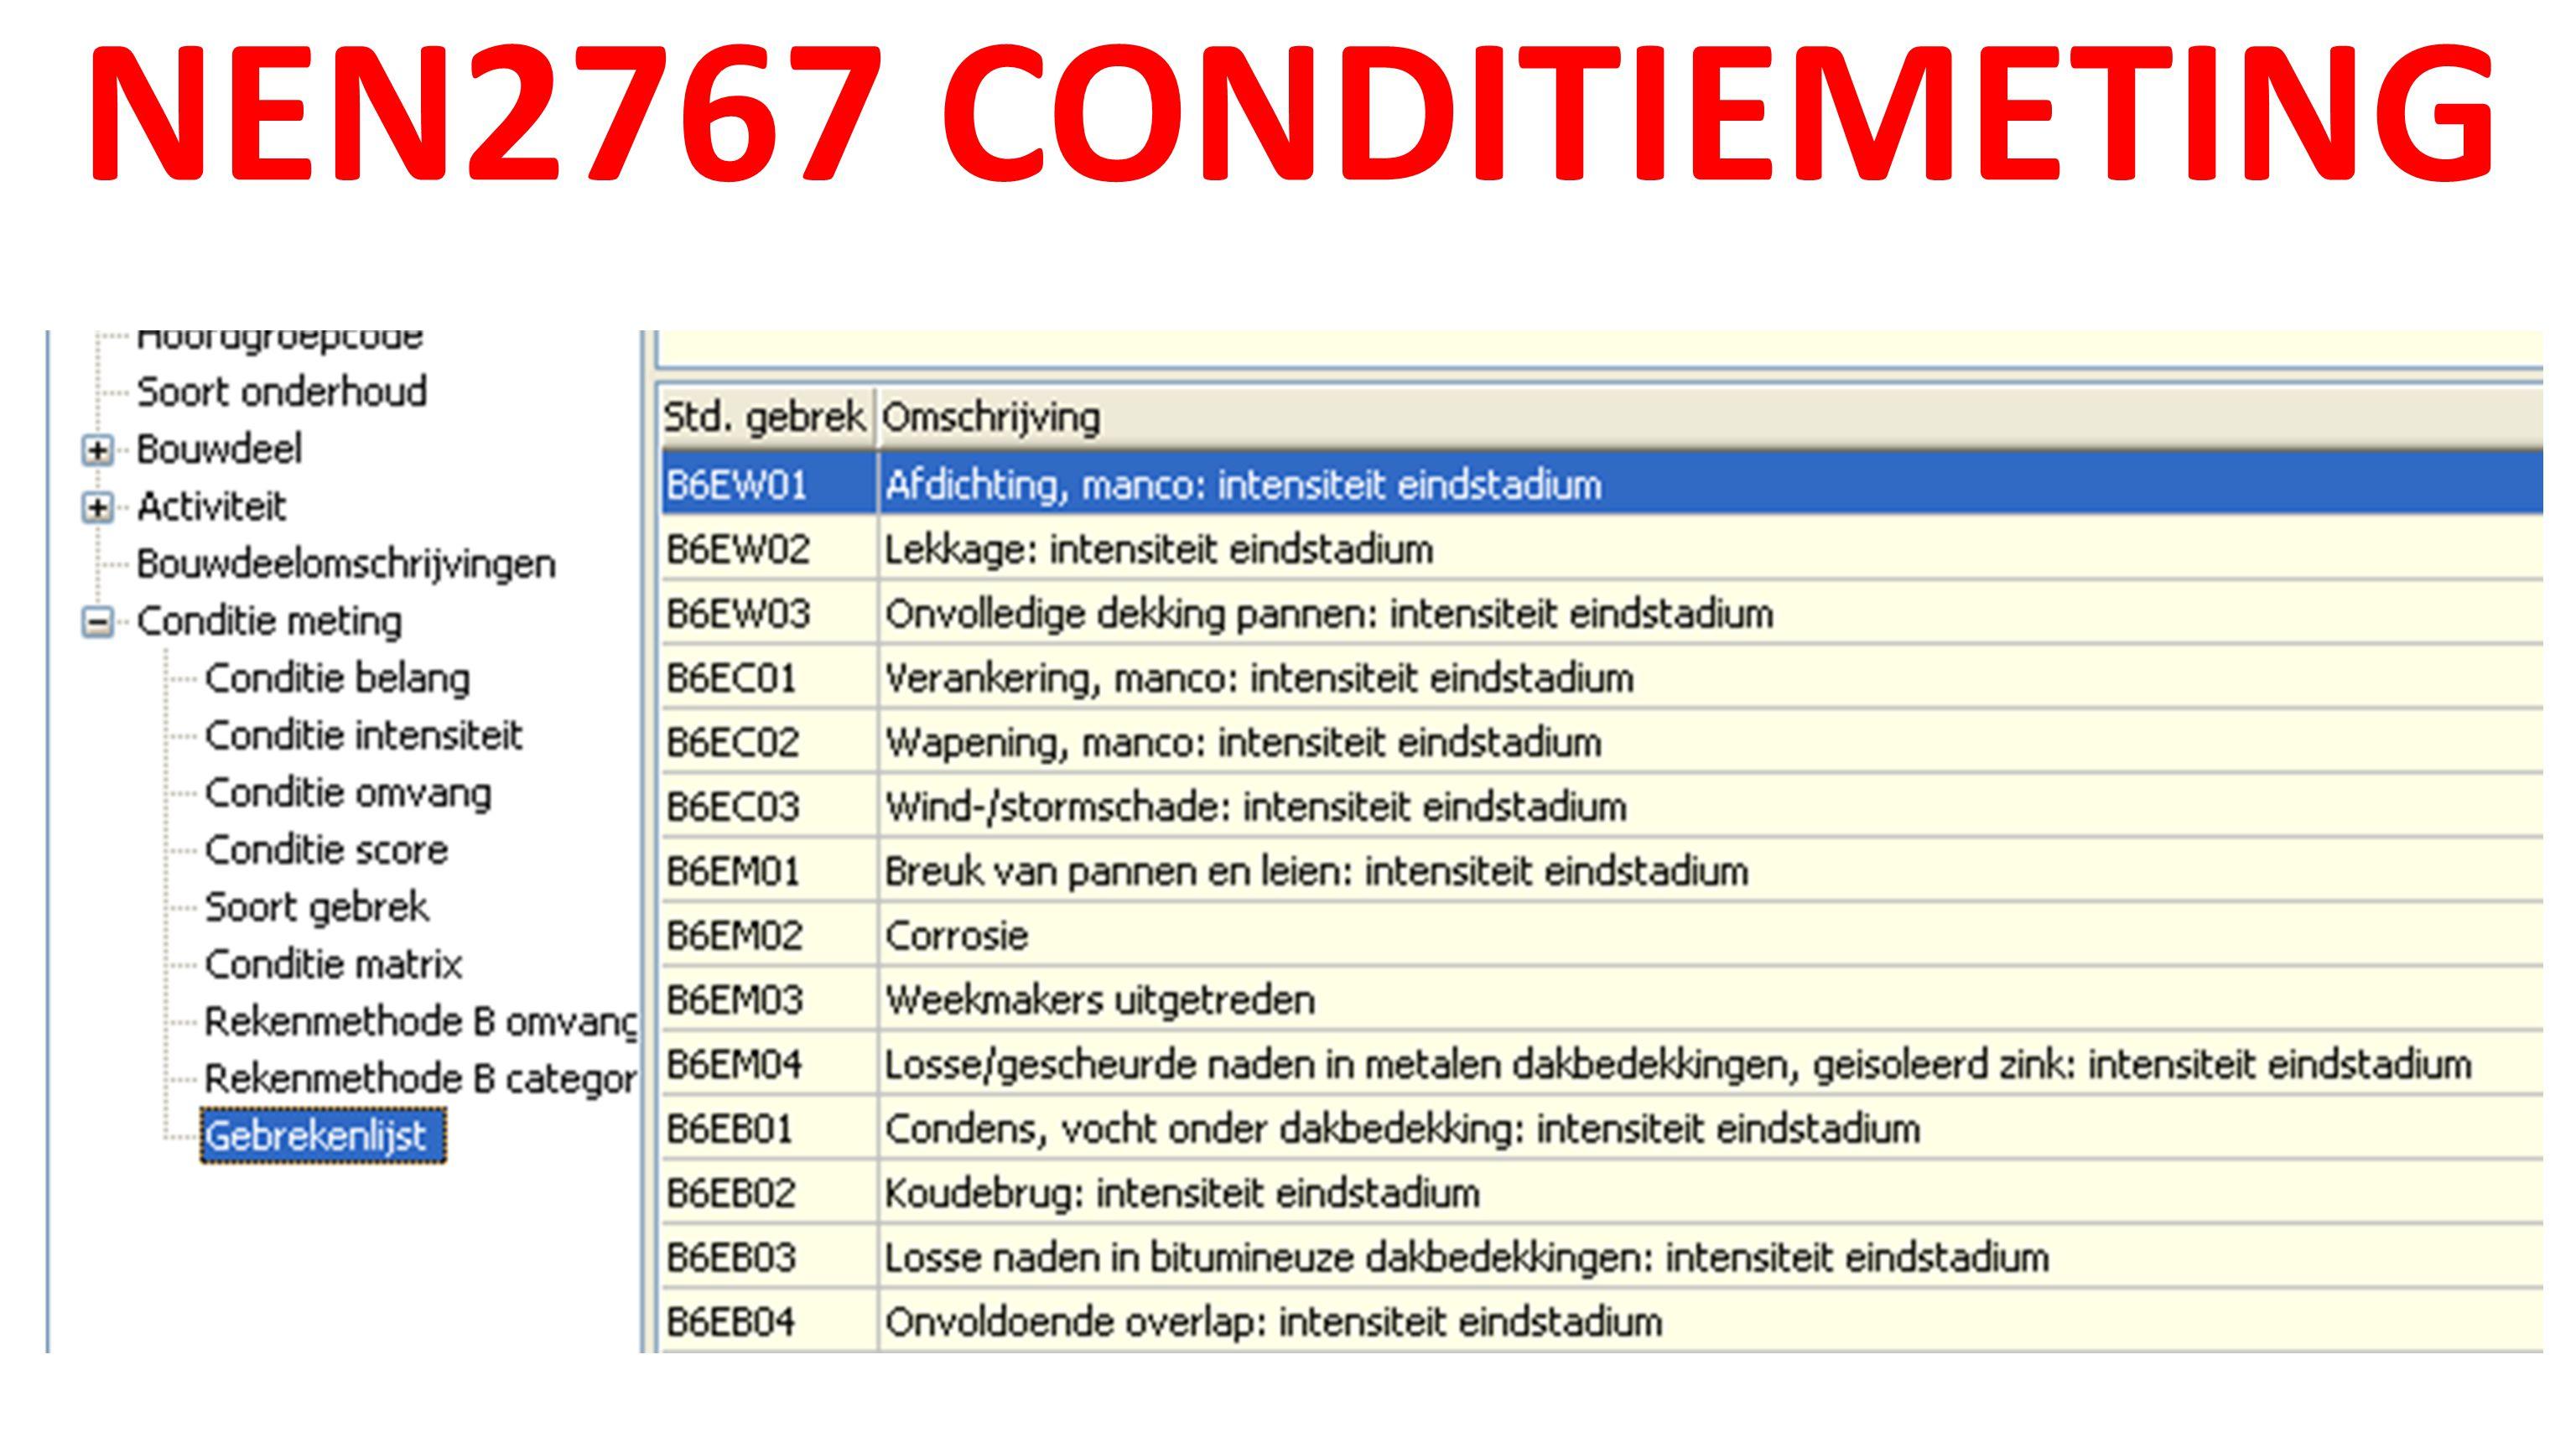 NEN2767 CONDITIEMETING